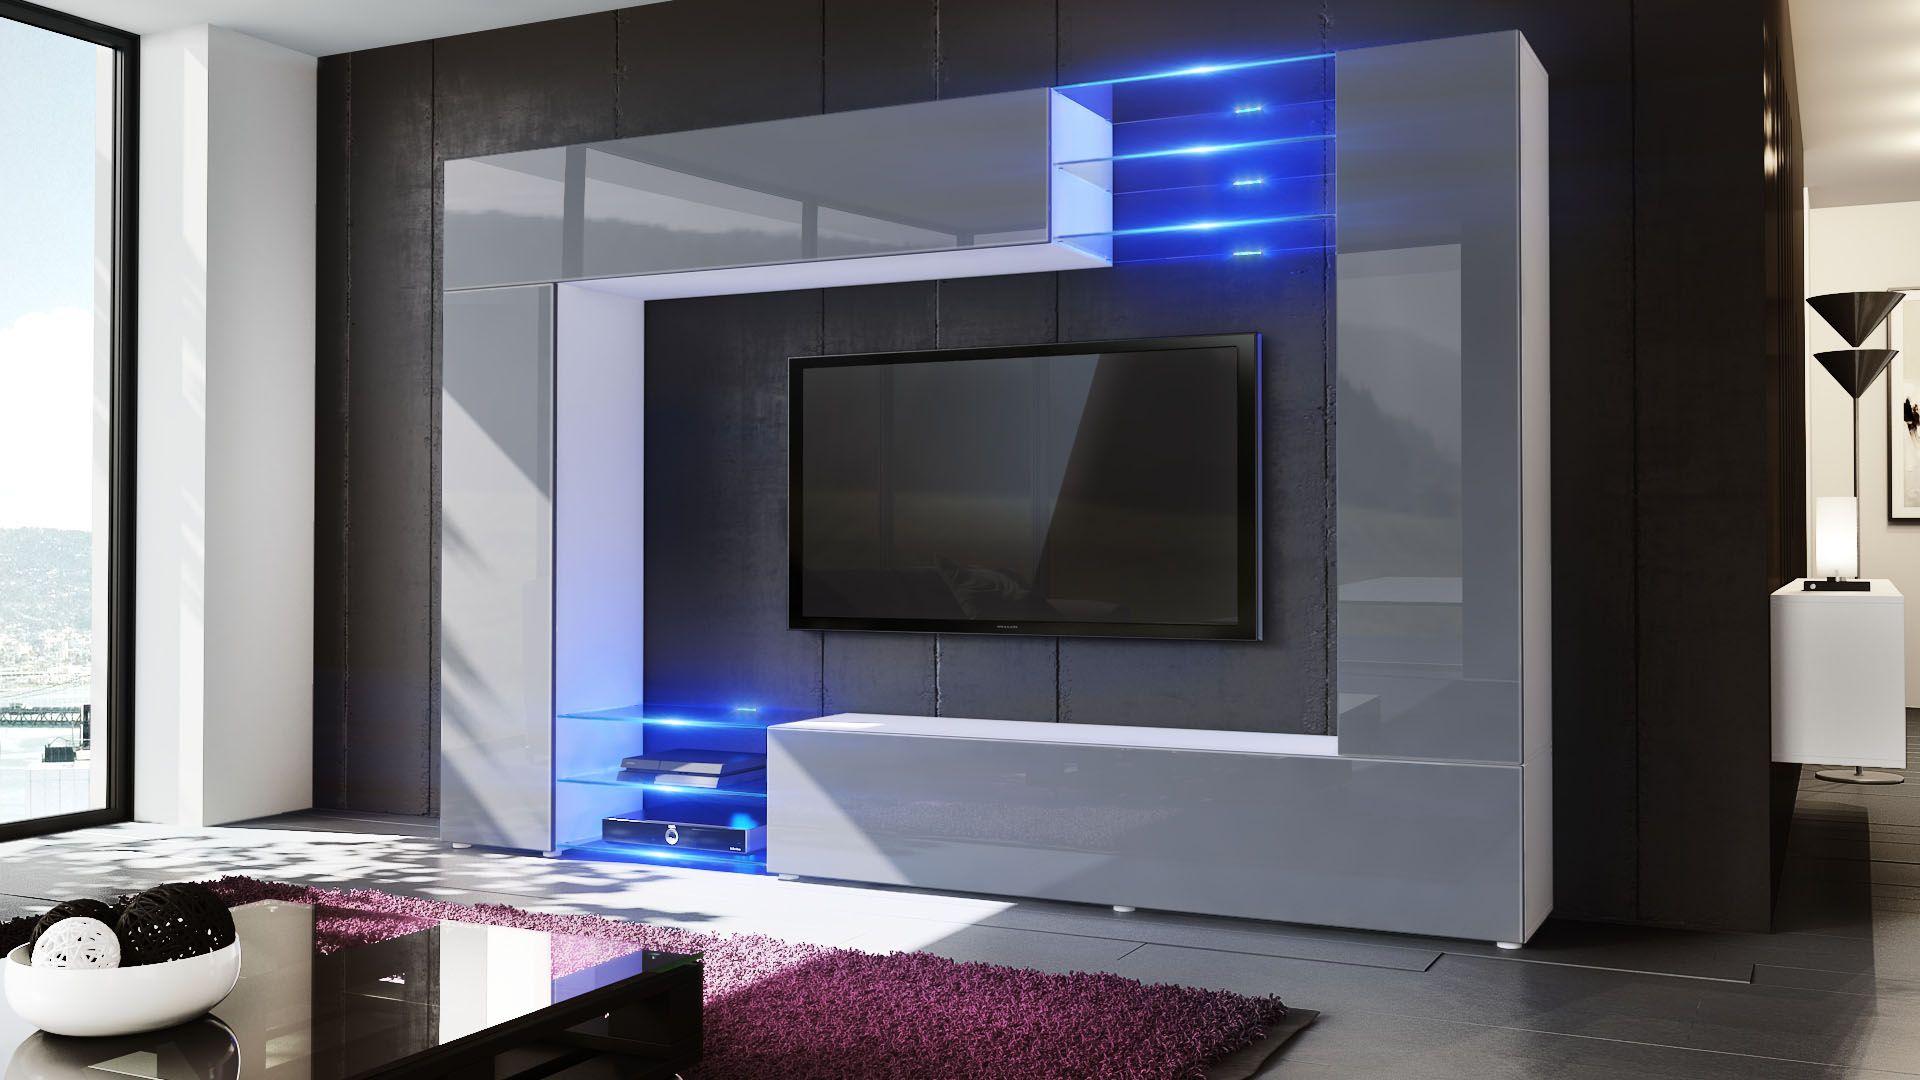 Mirage Wohnwand In Moderner Rahmenoptik Mit LED Beleuchtung